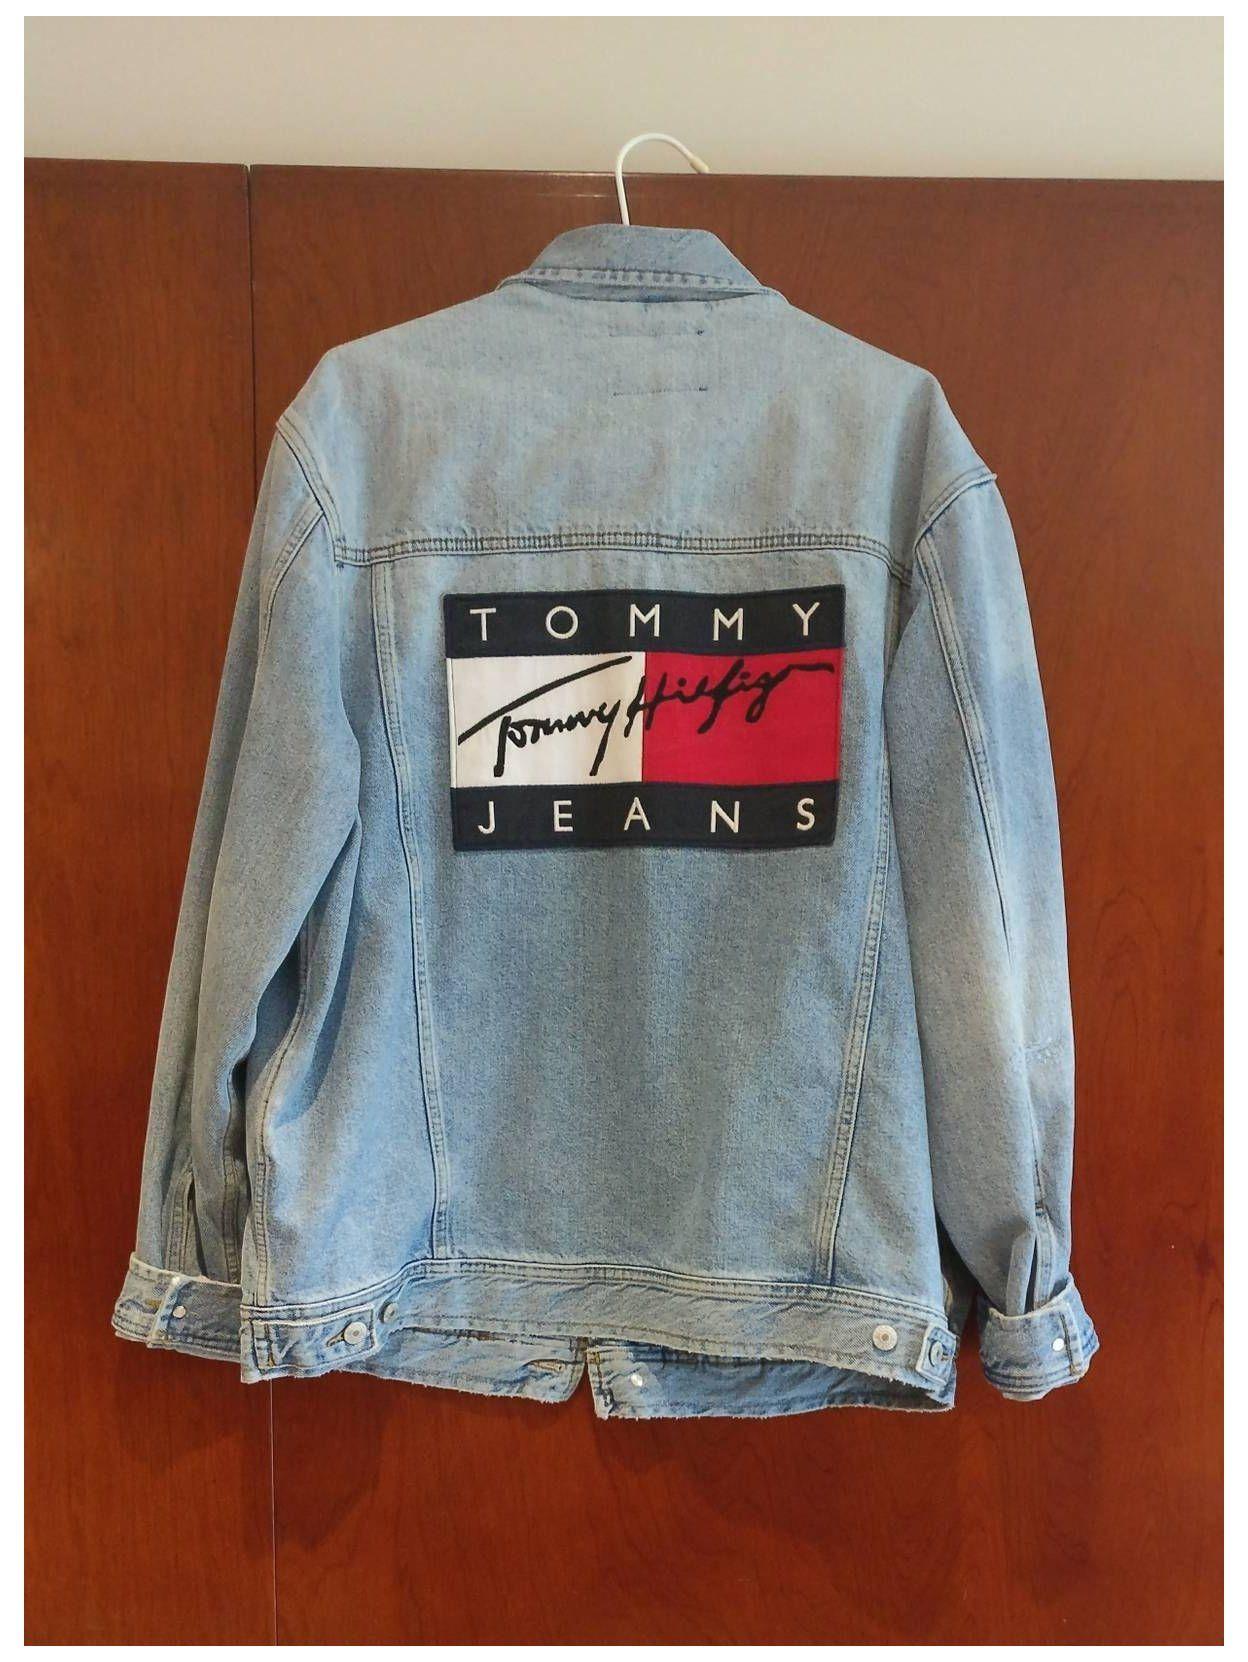 Pin By Londonmilligan On Jacket In 2021 Tommy Hilfiger Sweatshirt Tommy Hilfiger Fashion Denim Jacket Women [ 1662 x 1248 Pixel ]